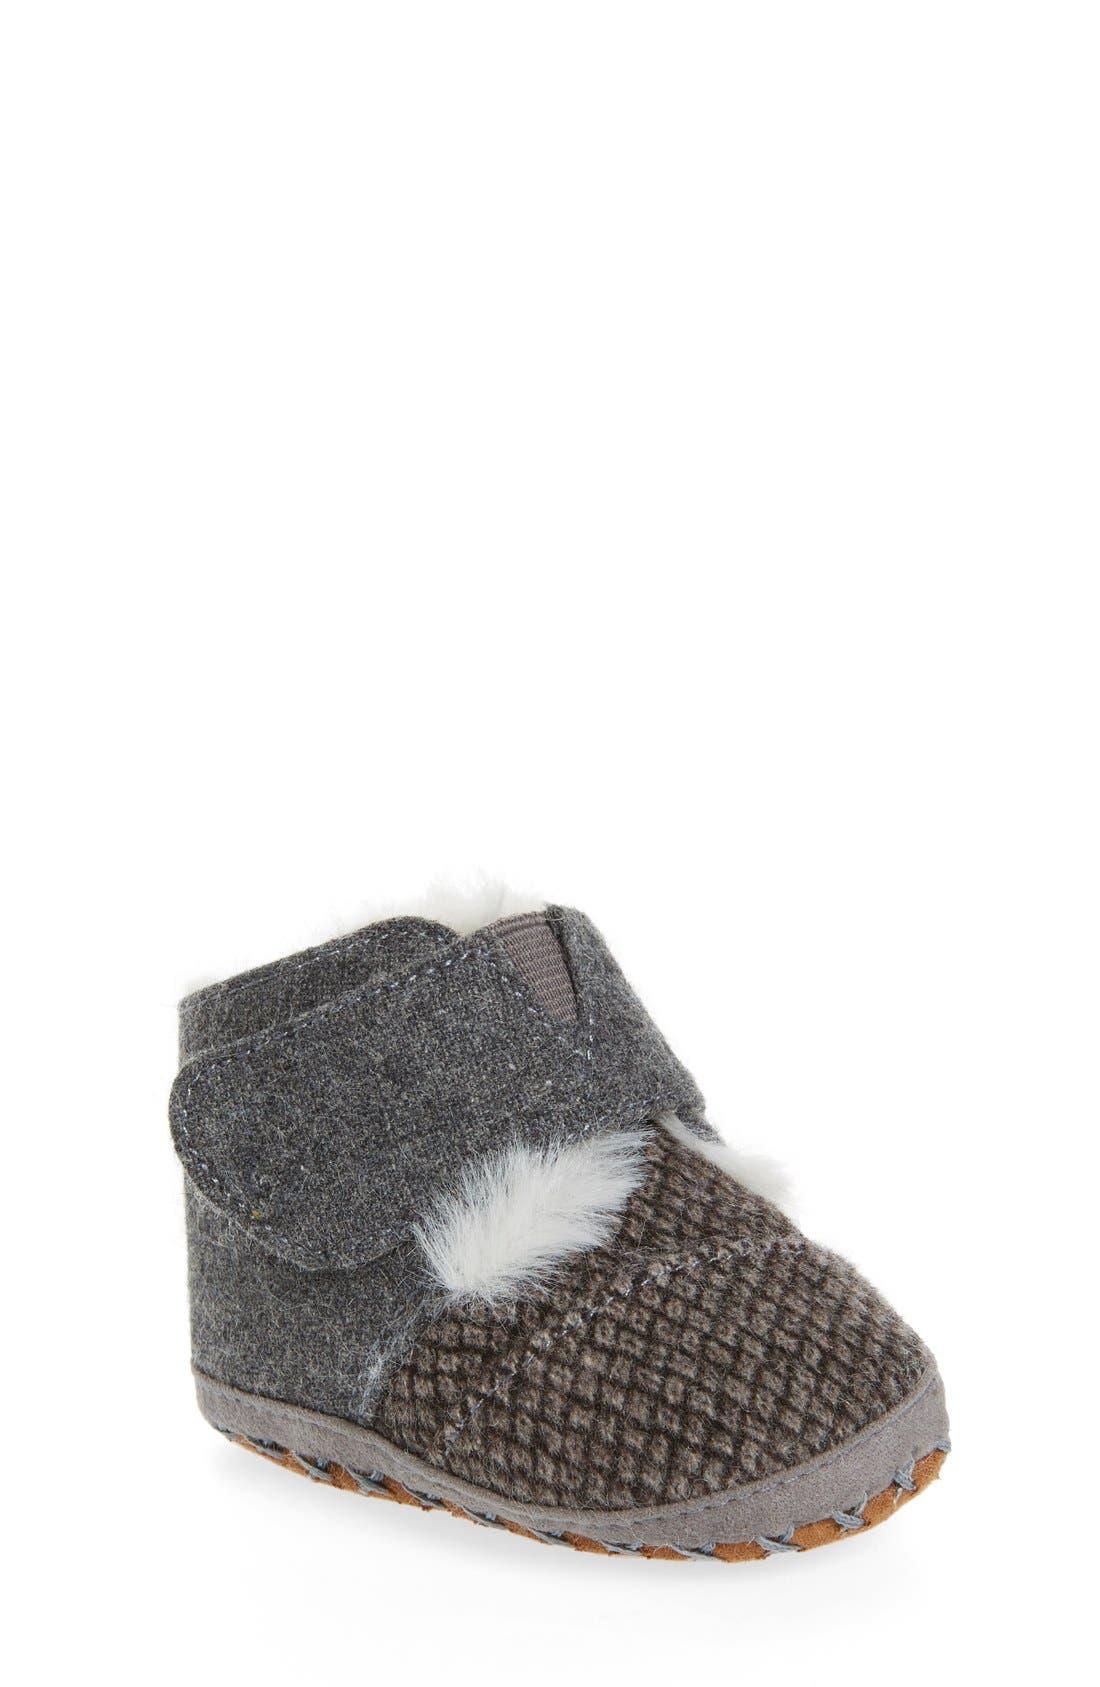 Main Image - TOMS Cuna Crib Shoe (Baby)